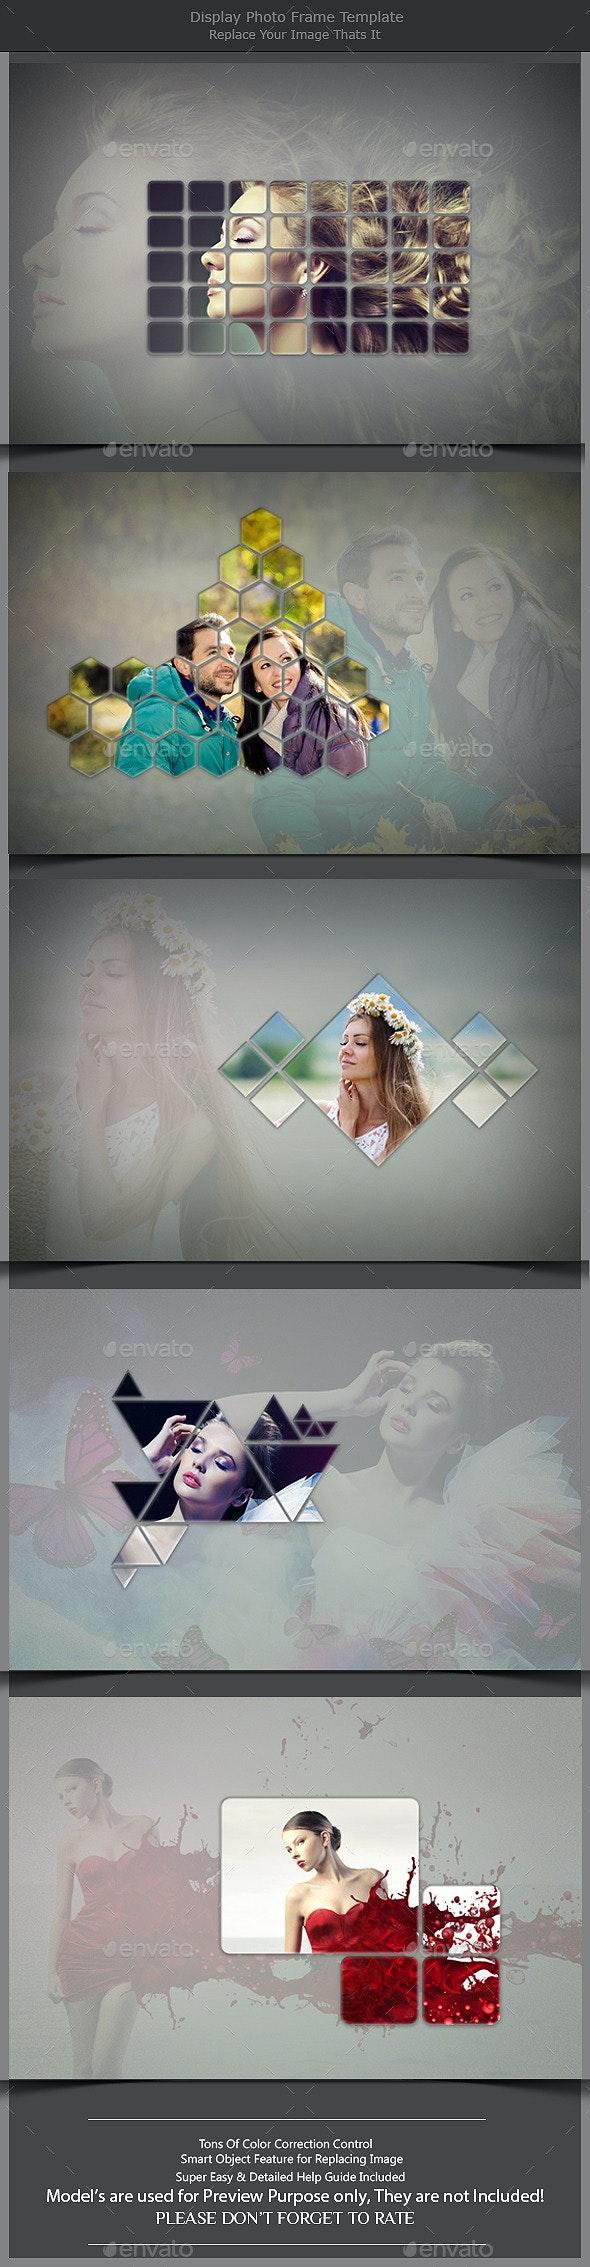 Display Photo Frame Template  - Photo Templates Graphics